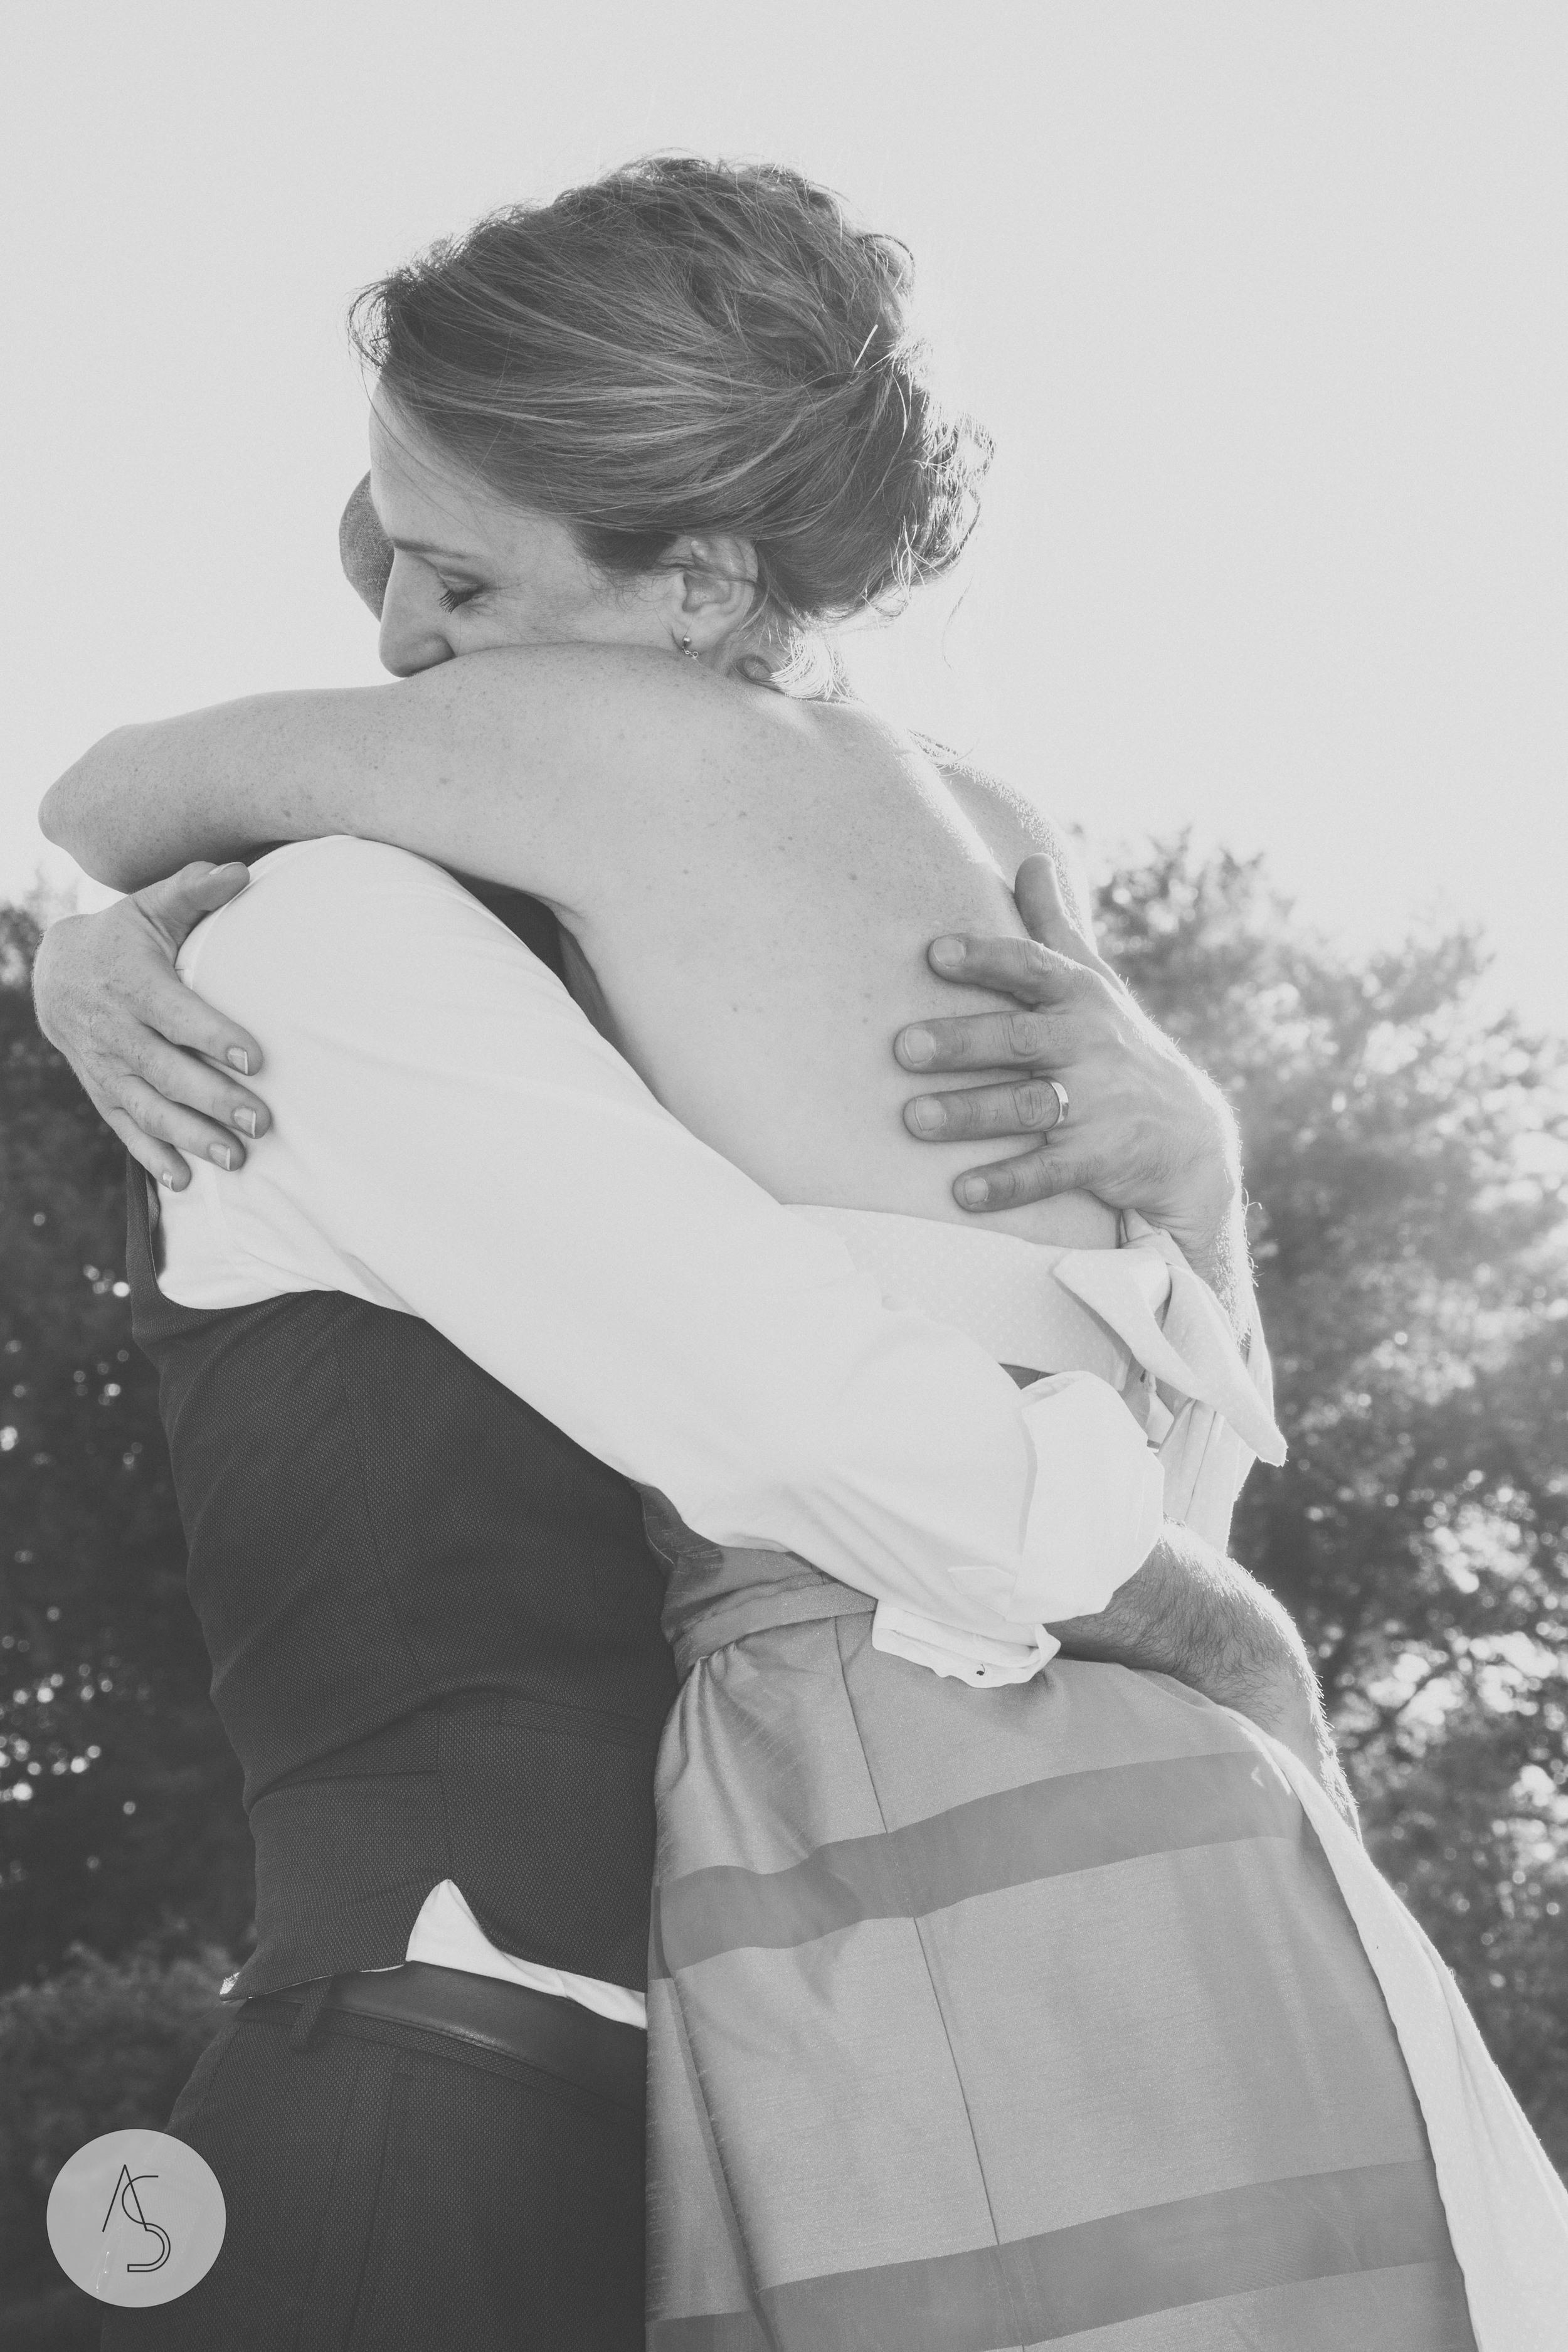 photographe mariage - Grenoble - Rhone Alpes - Adriana Salazar photo-99.jpg